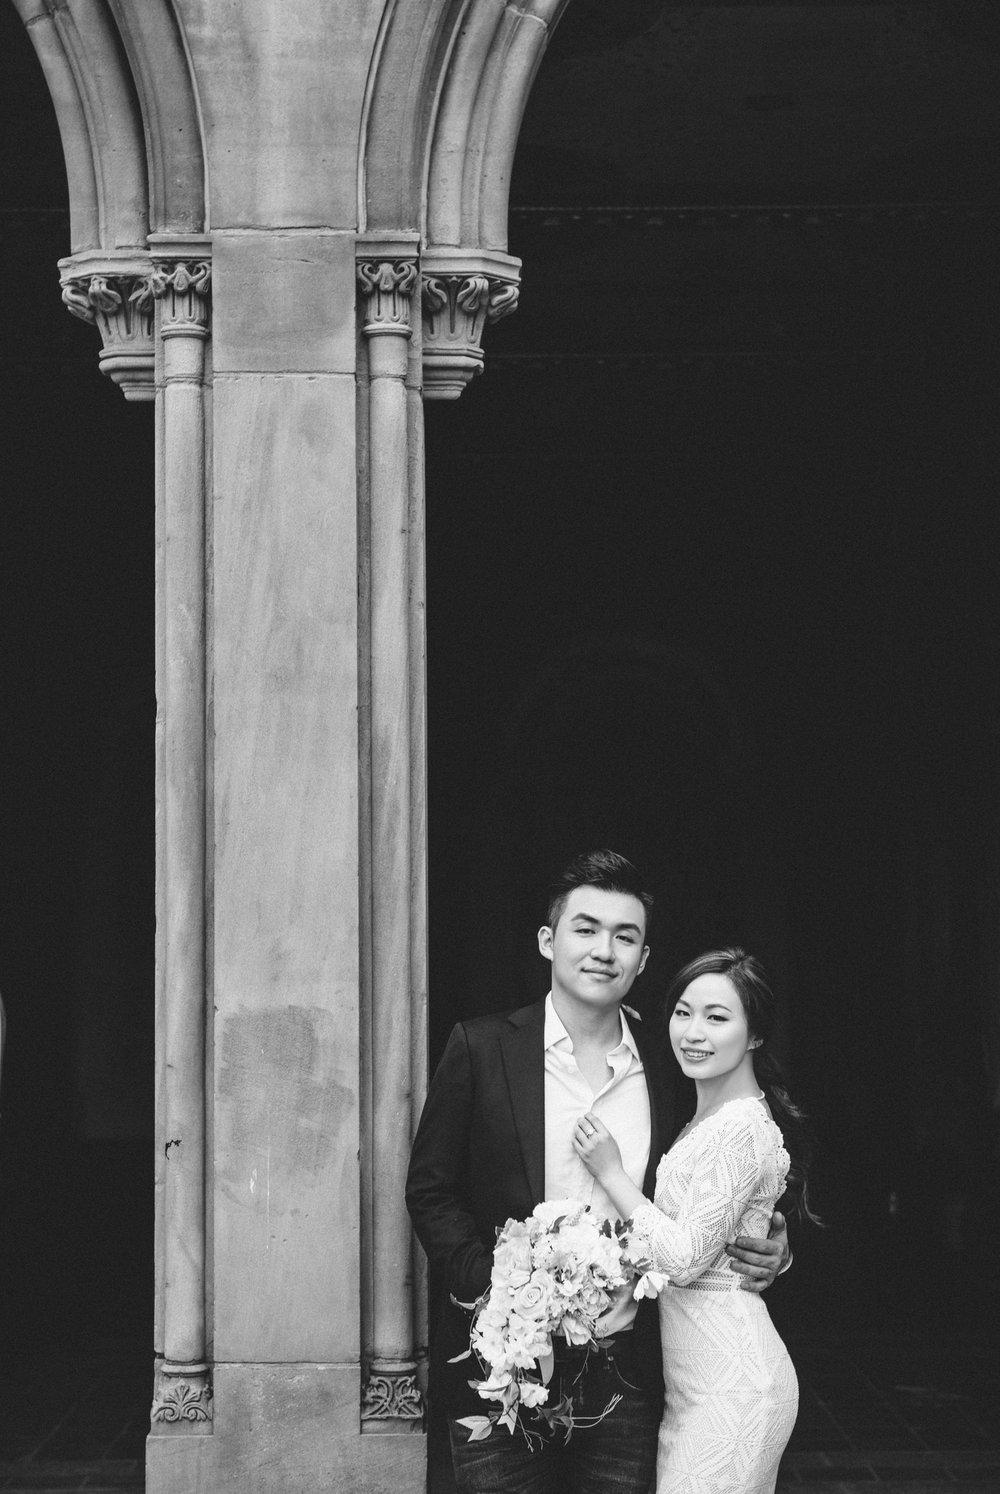 Central Park_海外婚紗_紐約海外婚紗_purefoto